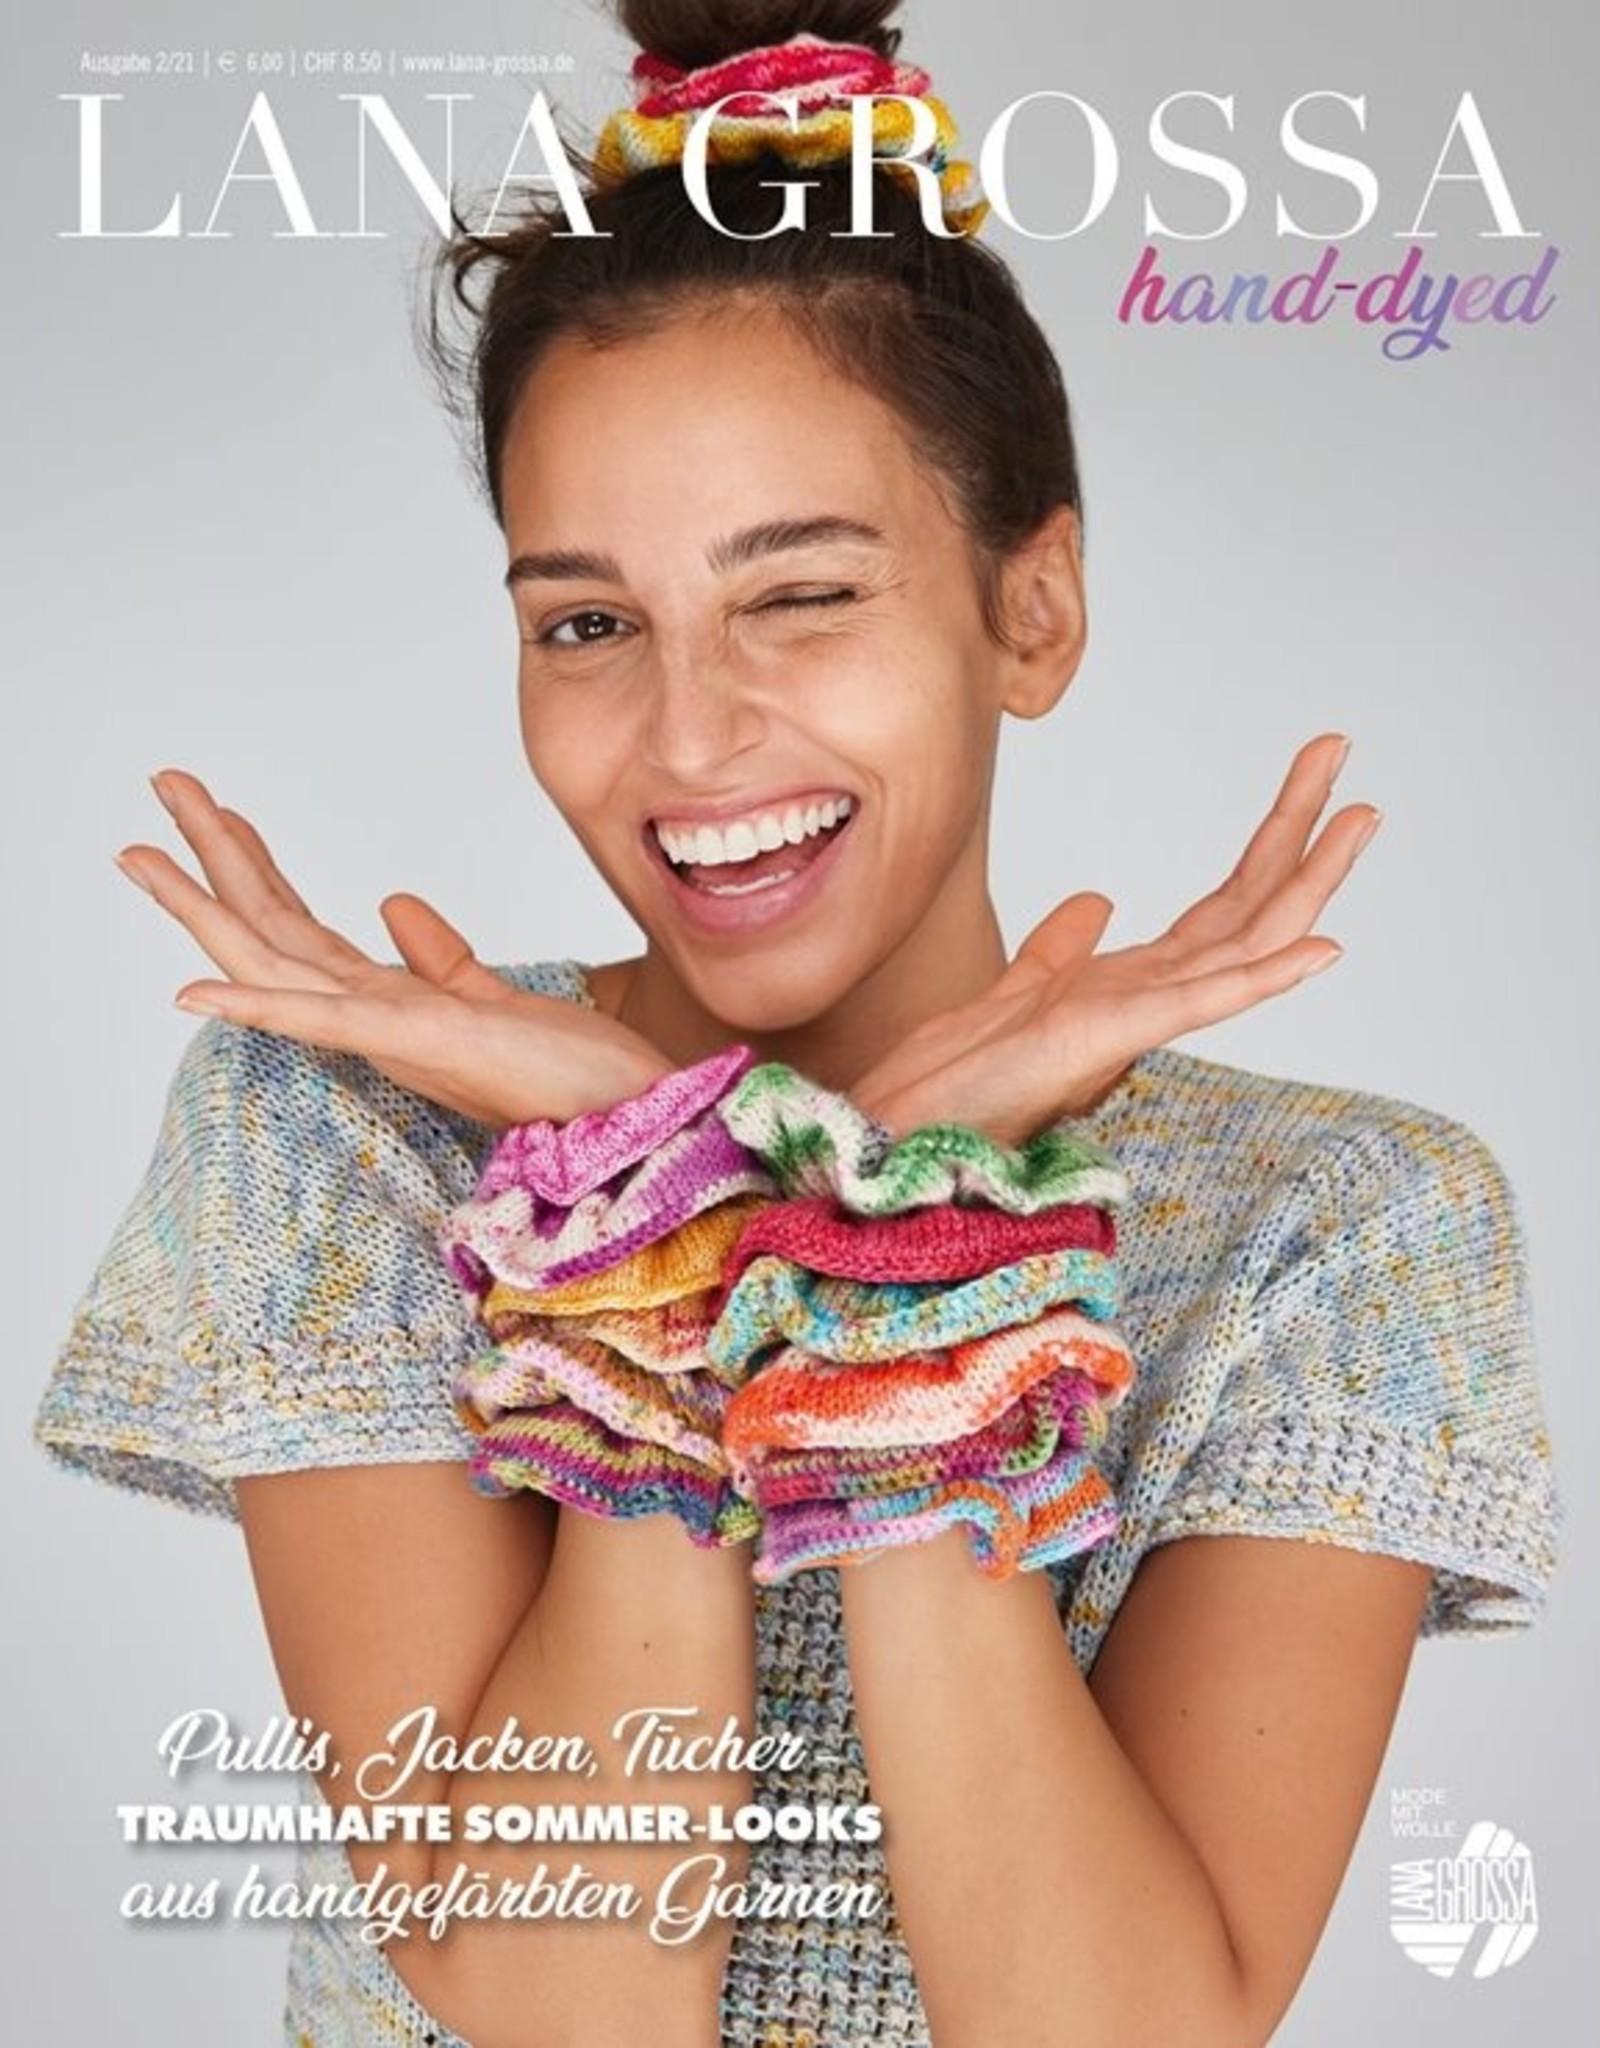 Lana Grossa hand-dyed nr 2